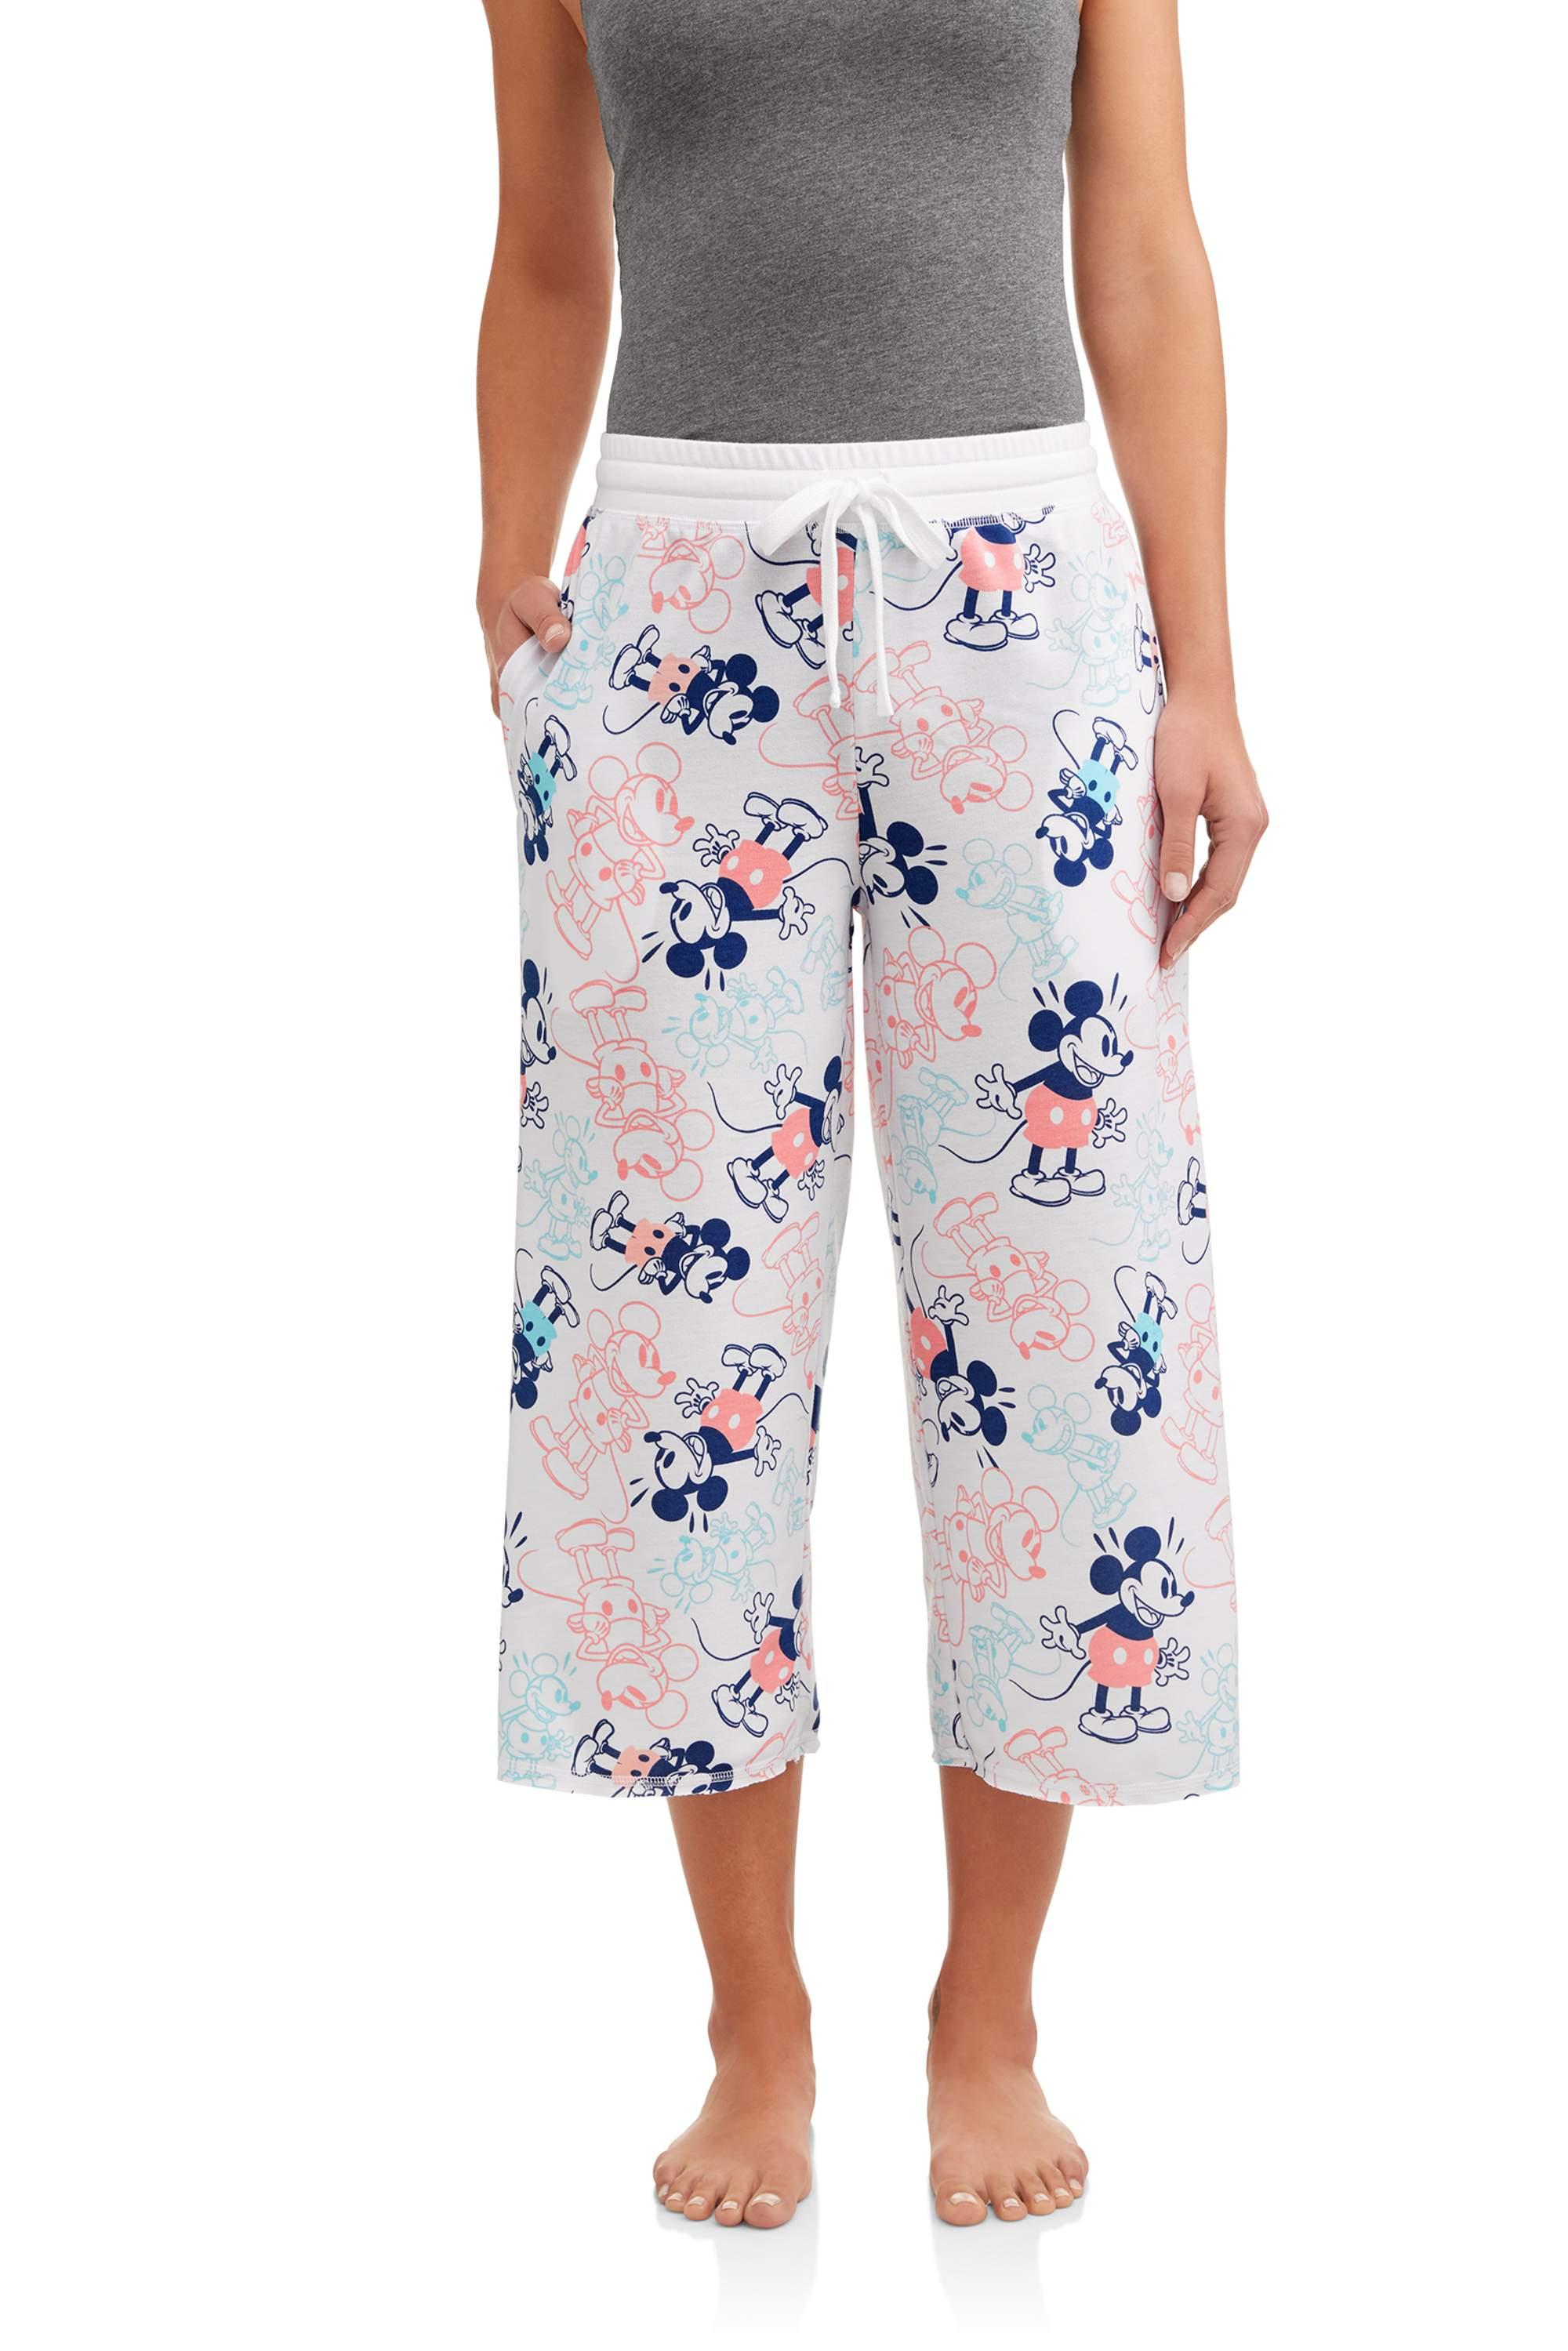 Disney Women's Plus License Pant Aladin